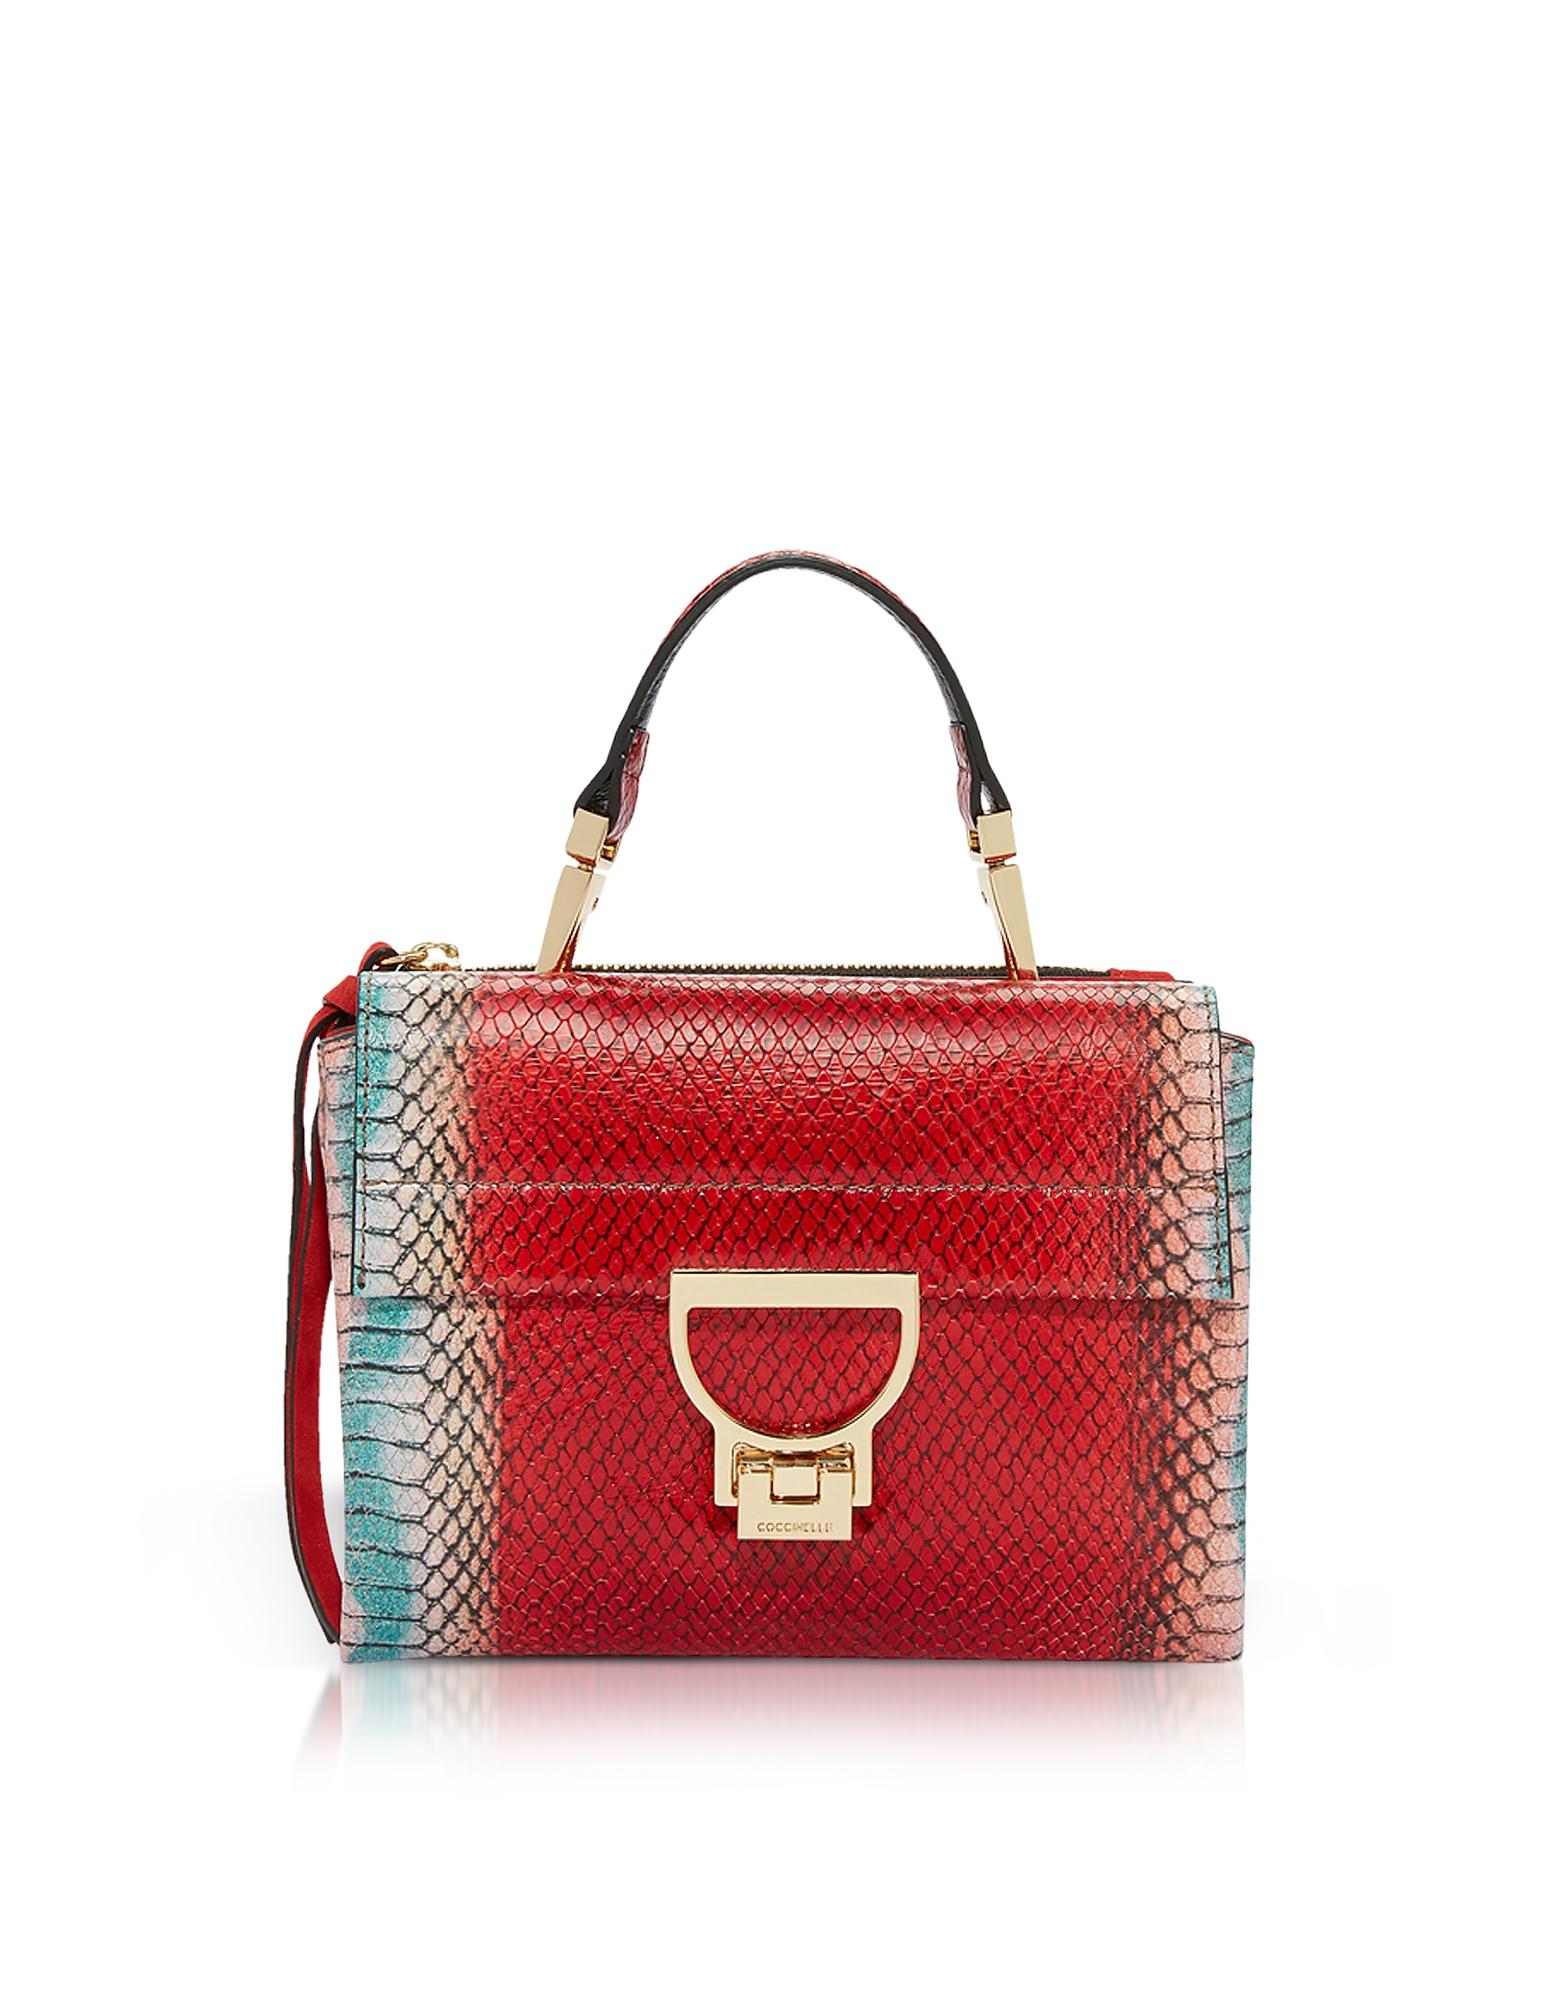 Arlettis Red Reptile Printed Leather Shoulder Bag